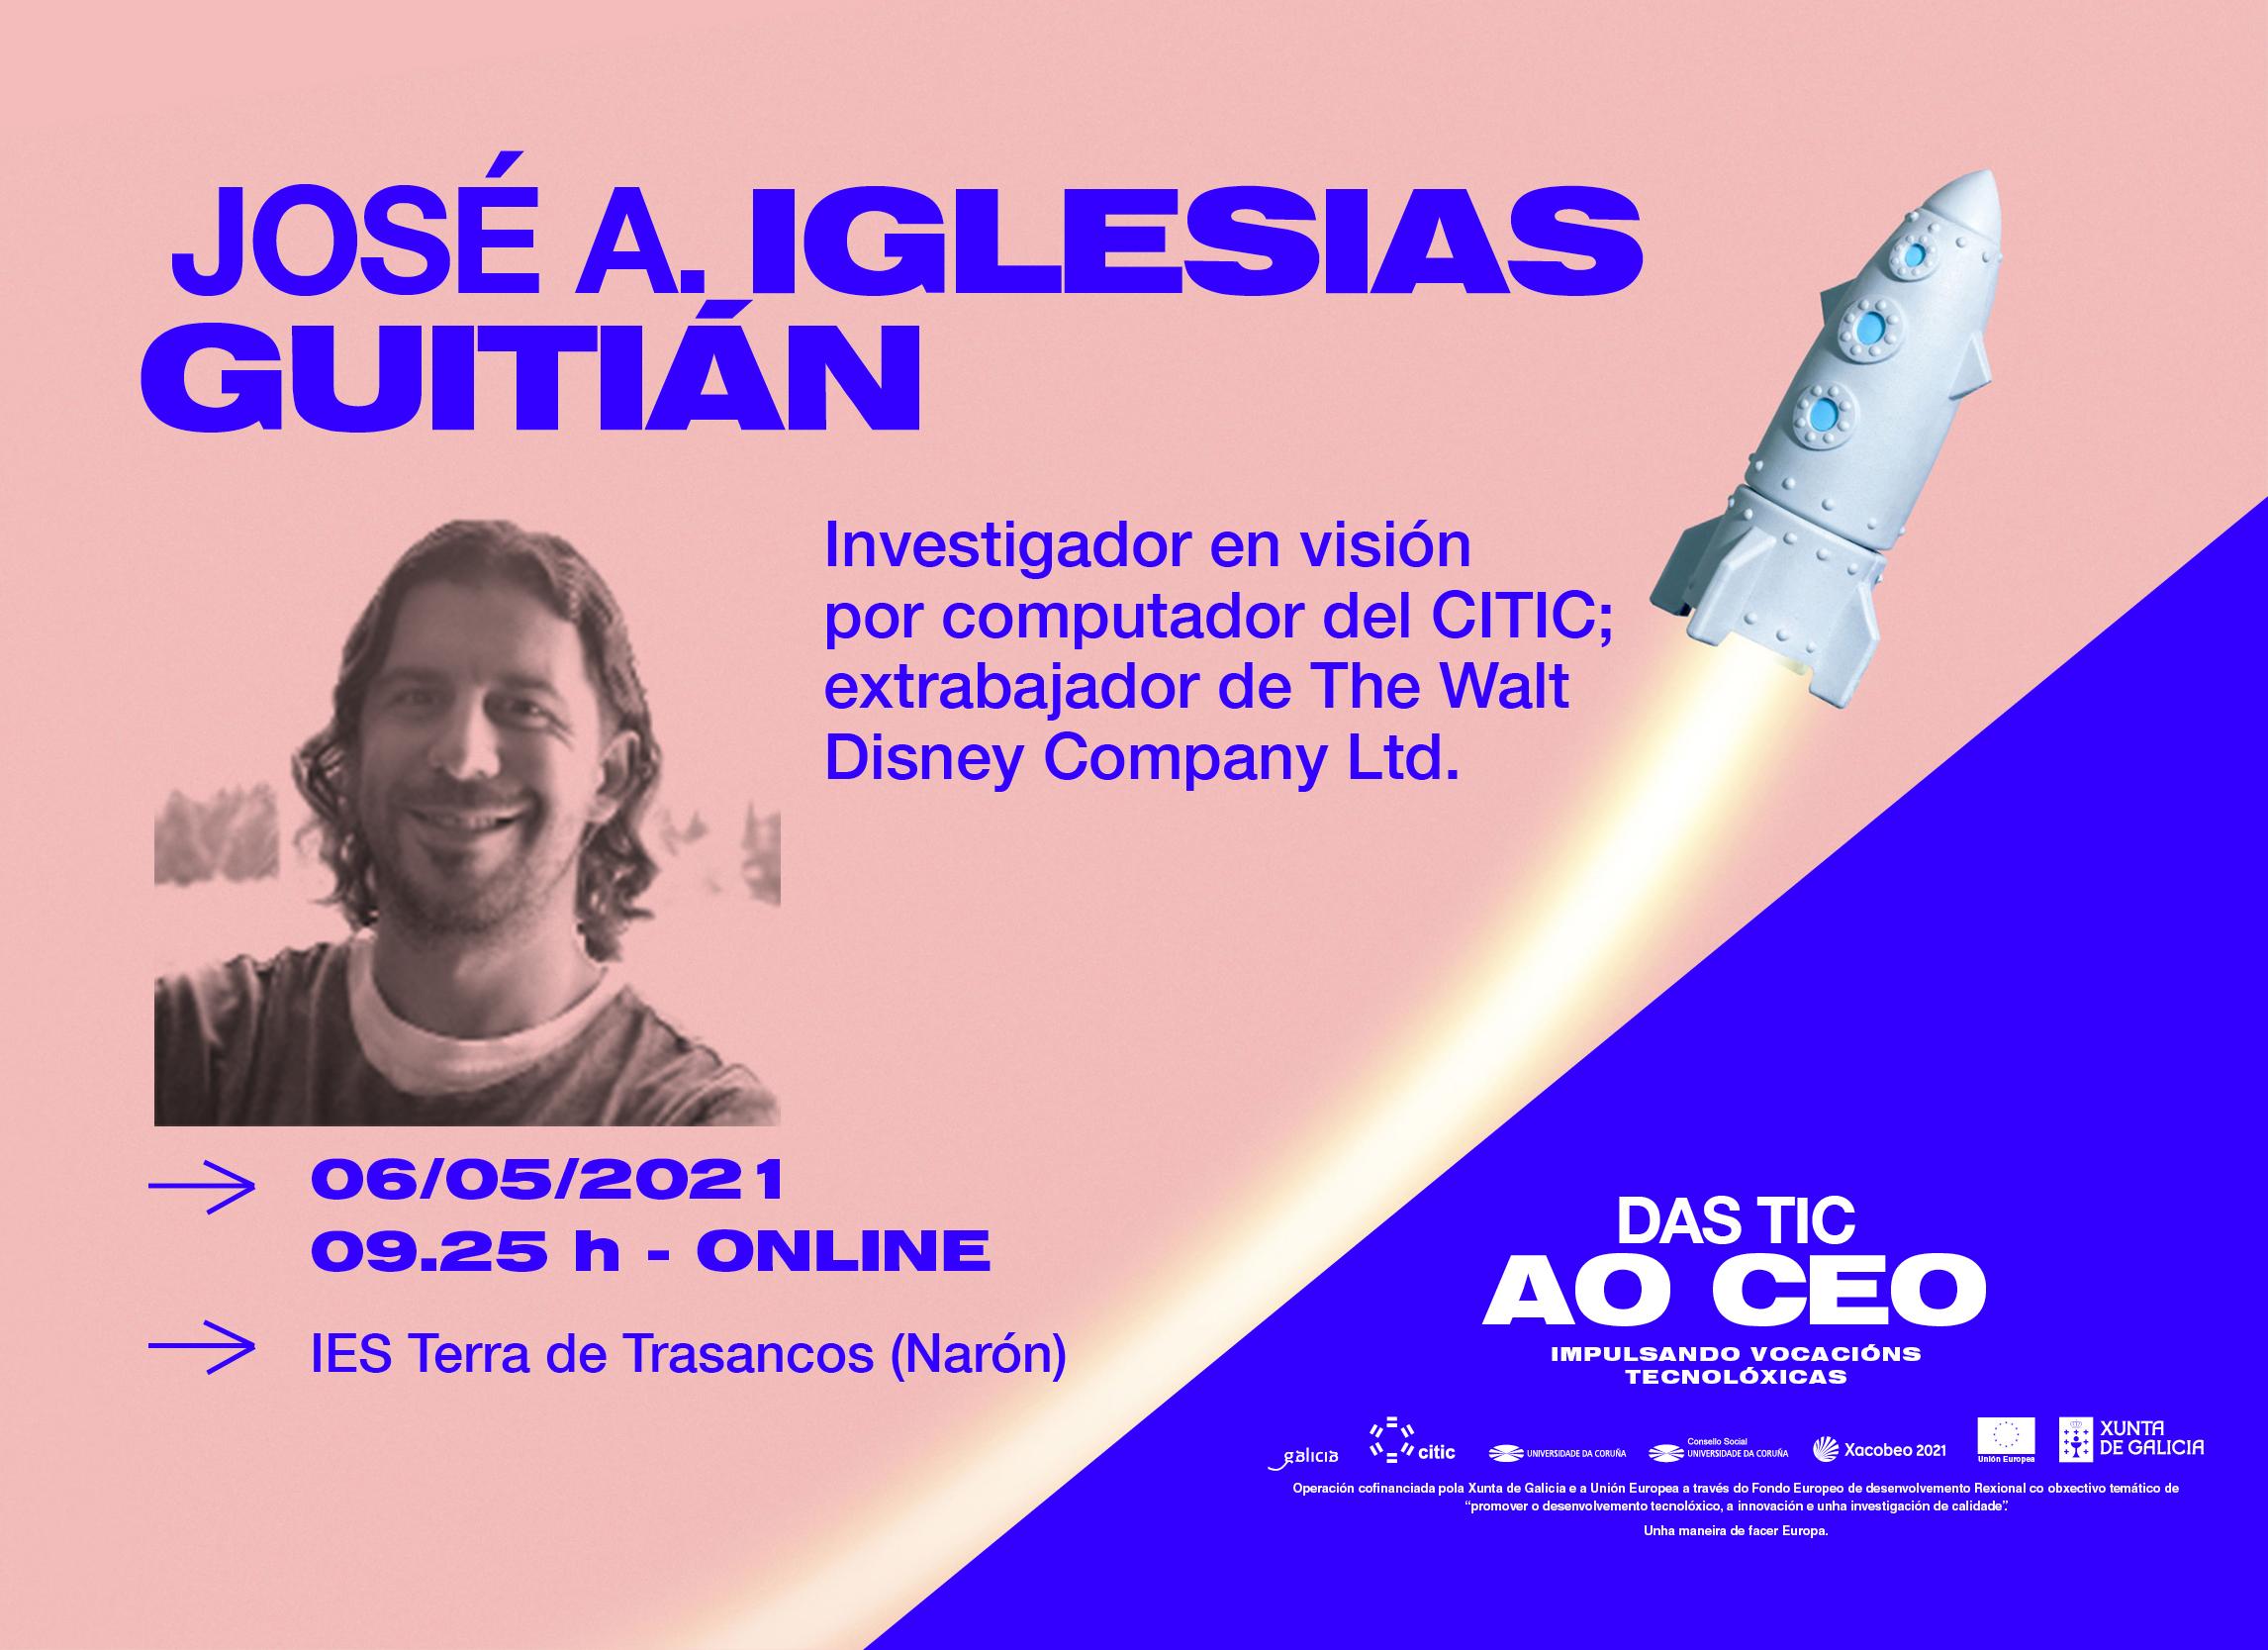 Vocacional José Iglesias 550x400 px